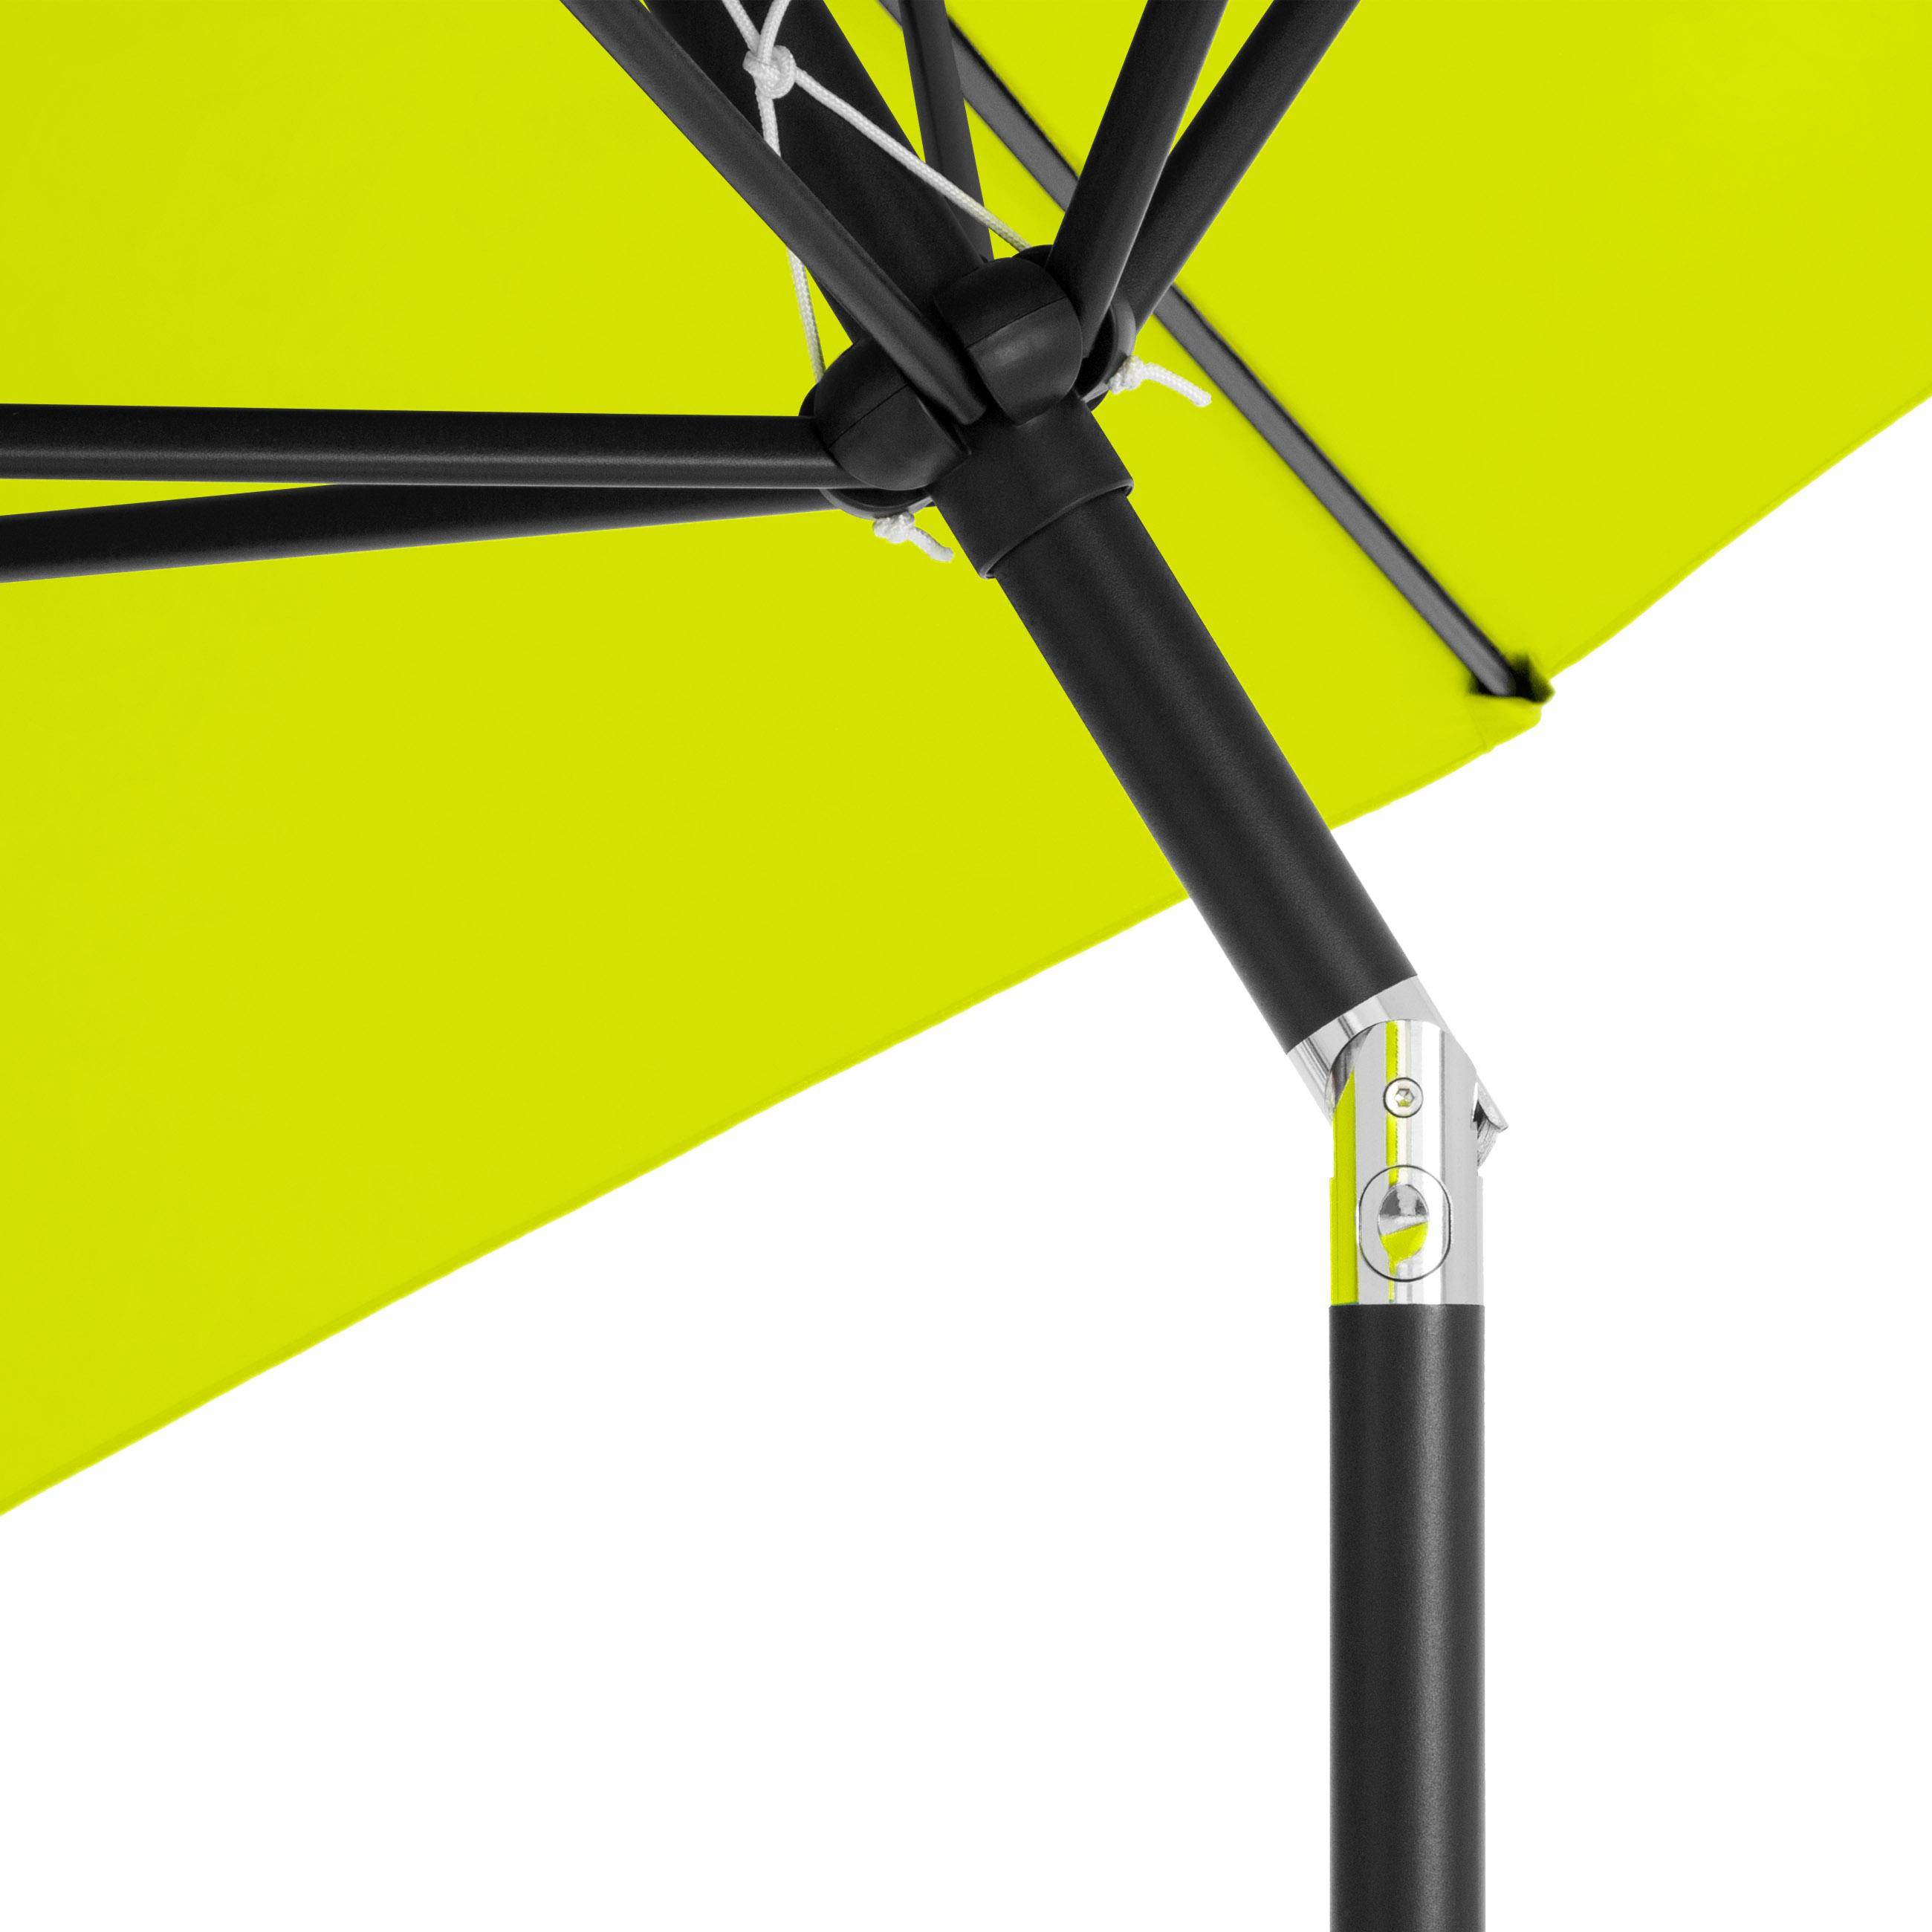 BCP-10ft-Outdoor-Steel-Market-Patio-Umbrella-Decoration-w-Tilt-Crank thumbnail 46